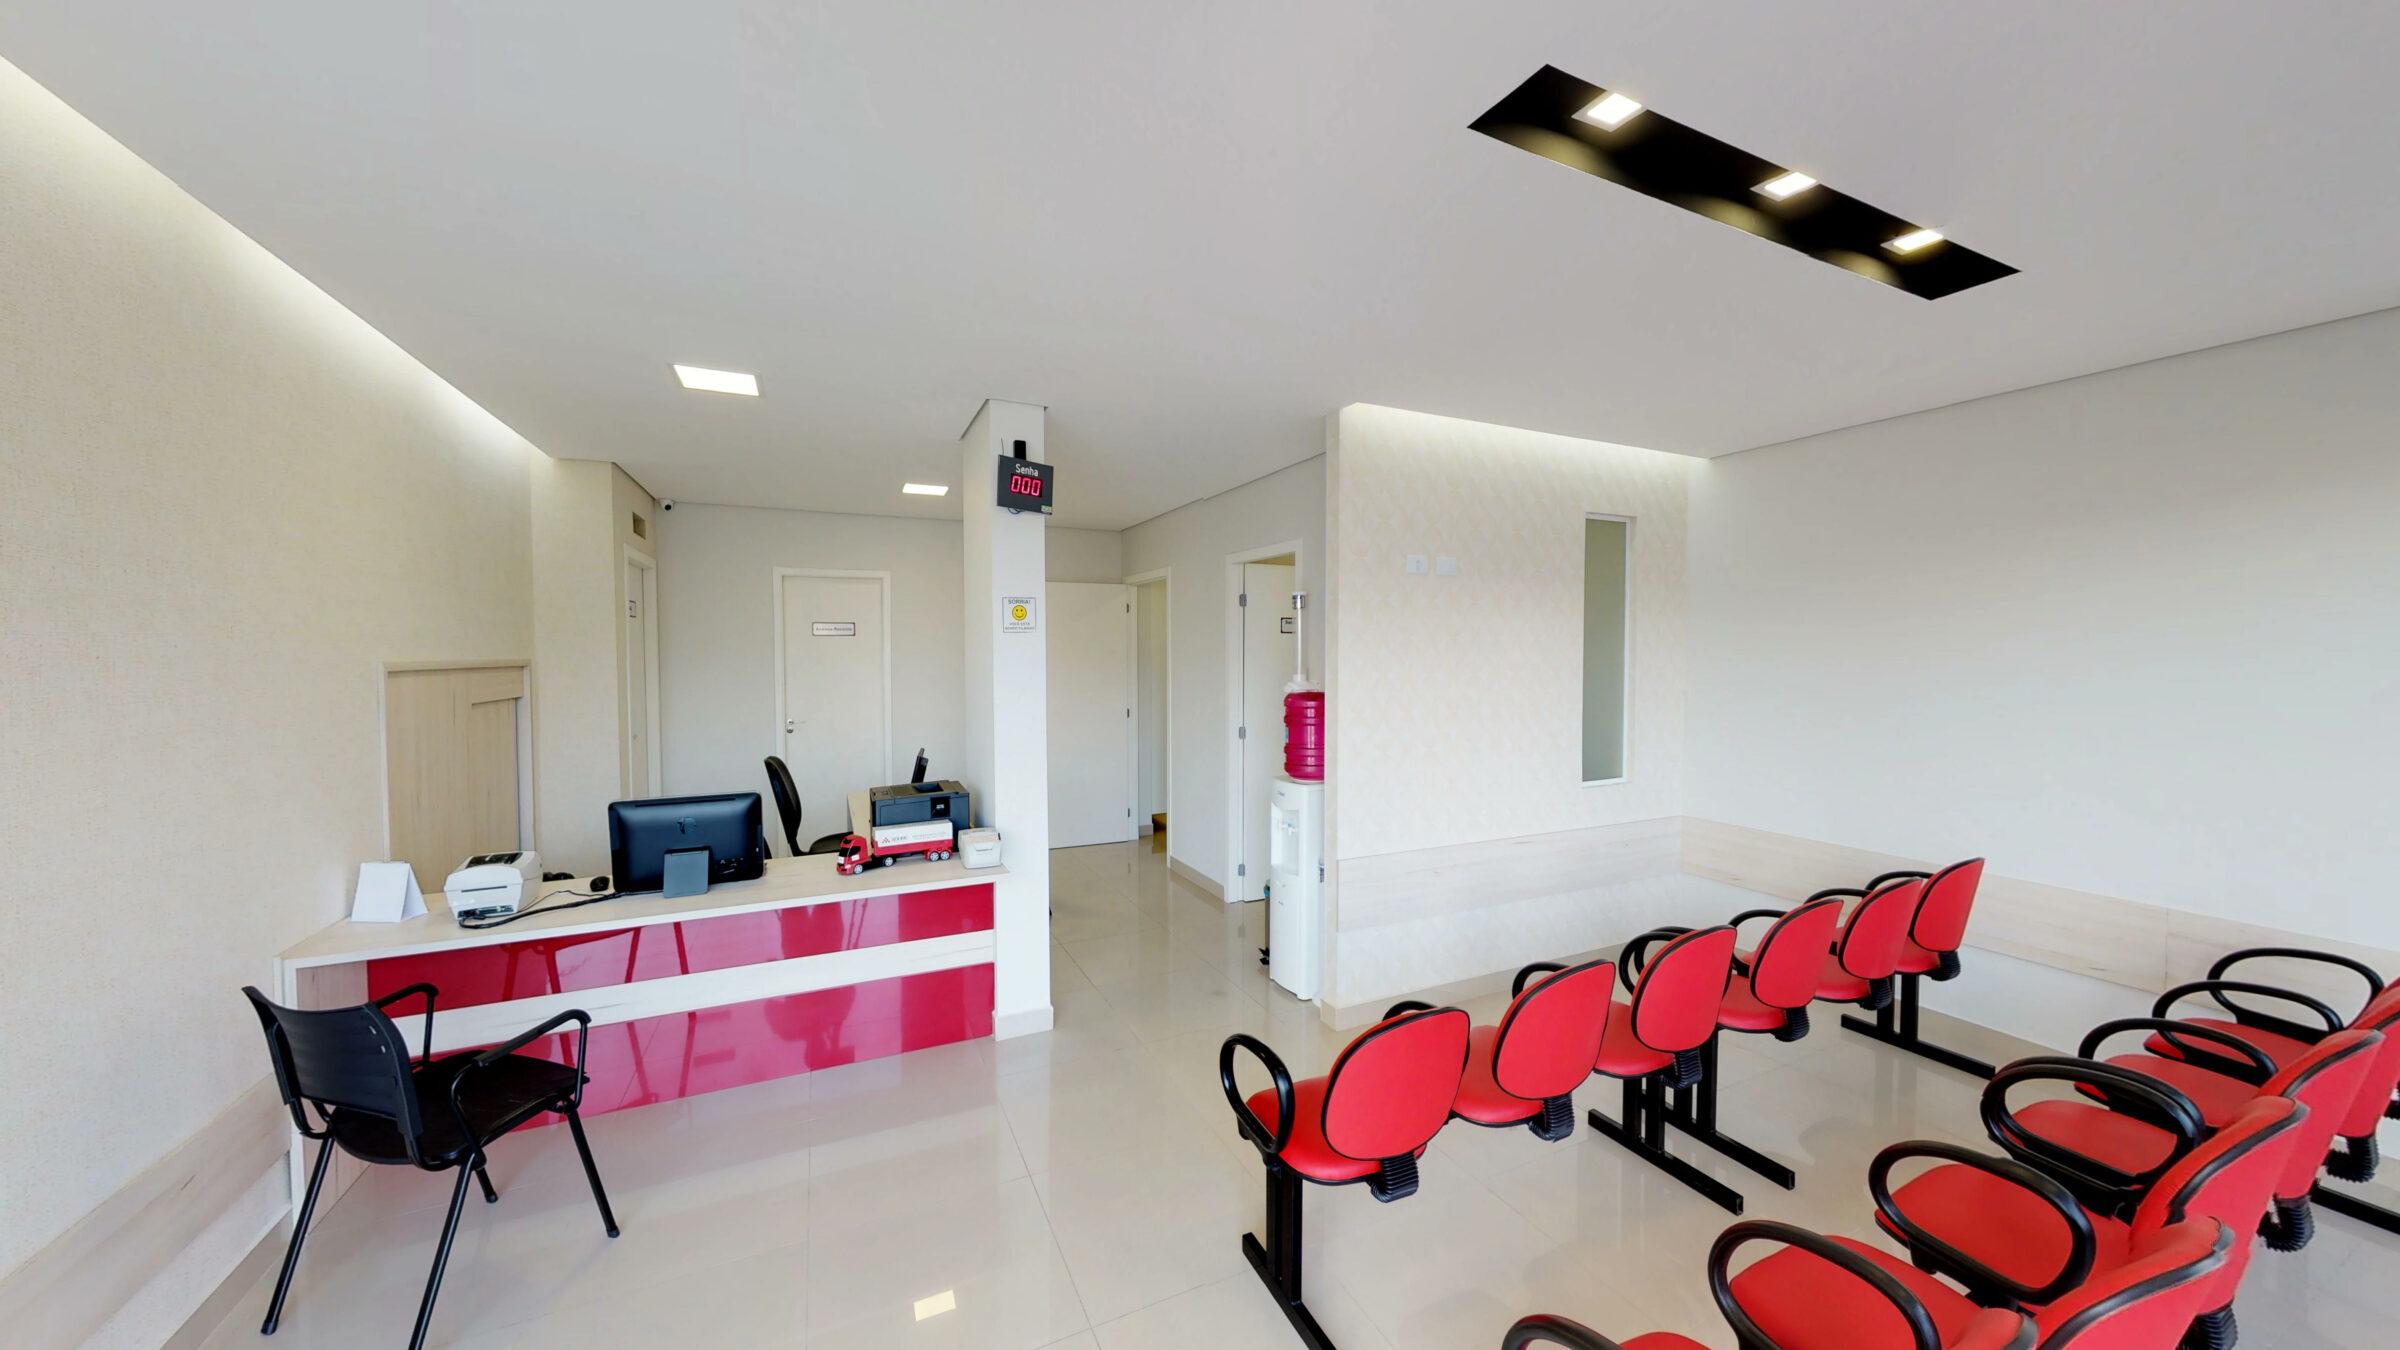 Foto 360º Capa 360º Tour Virtual Tour Virtual 360º Suhlab Analises Clinicas 094317